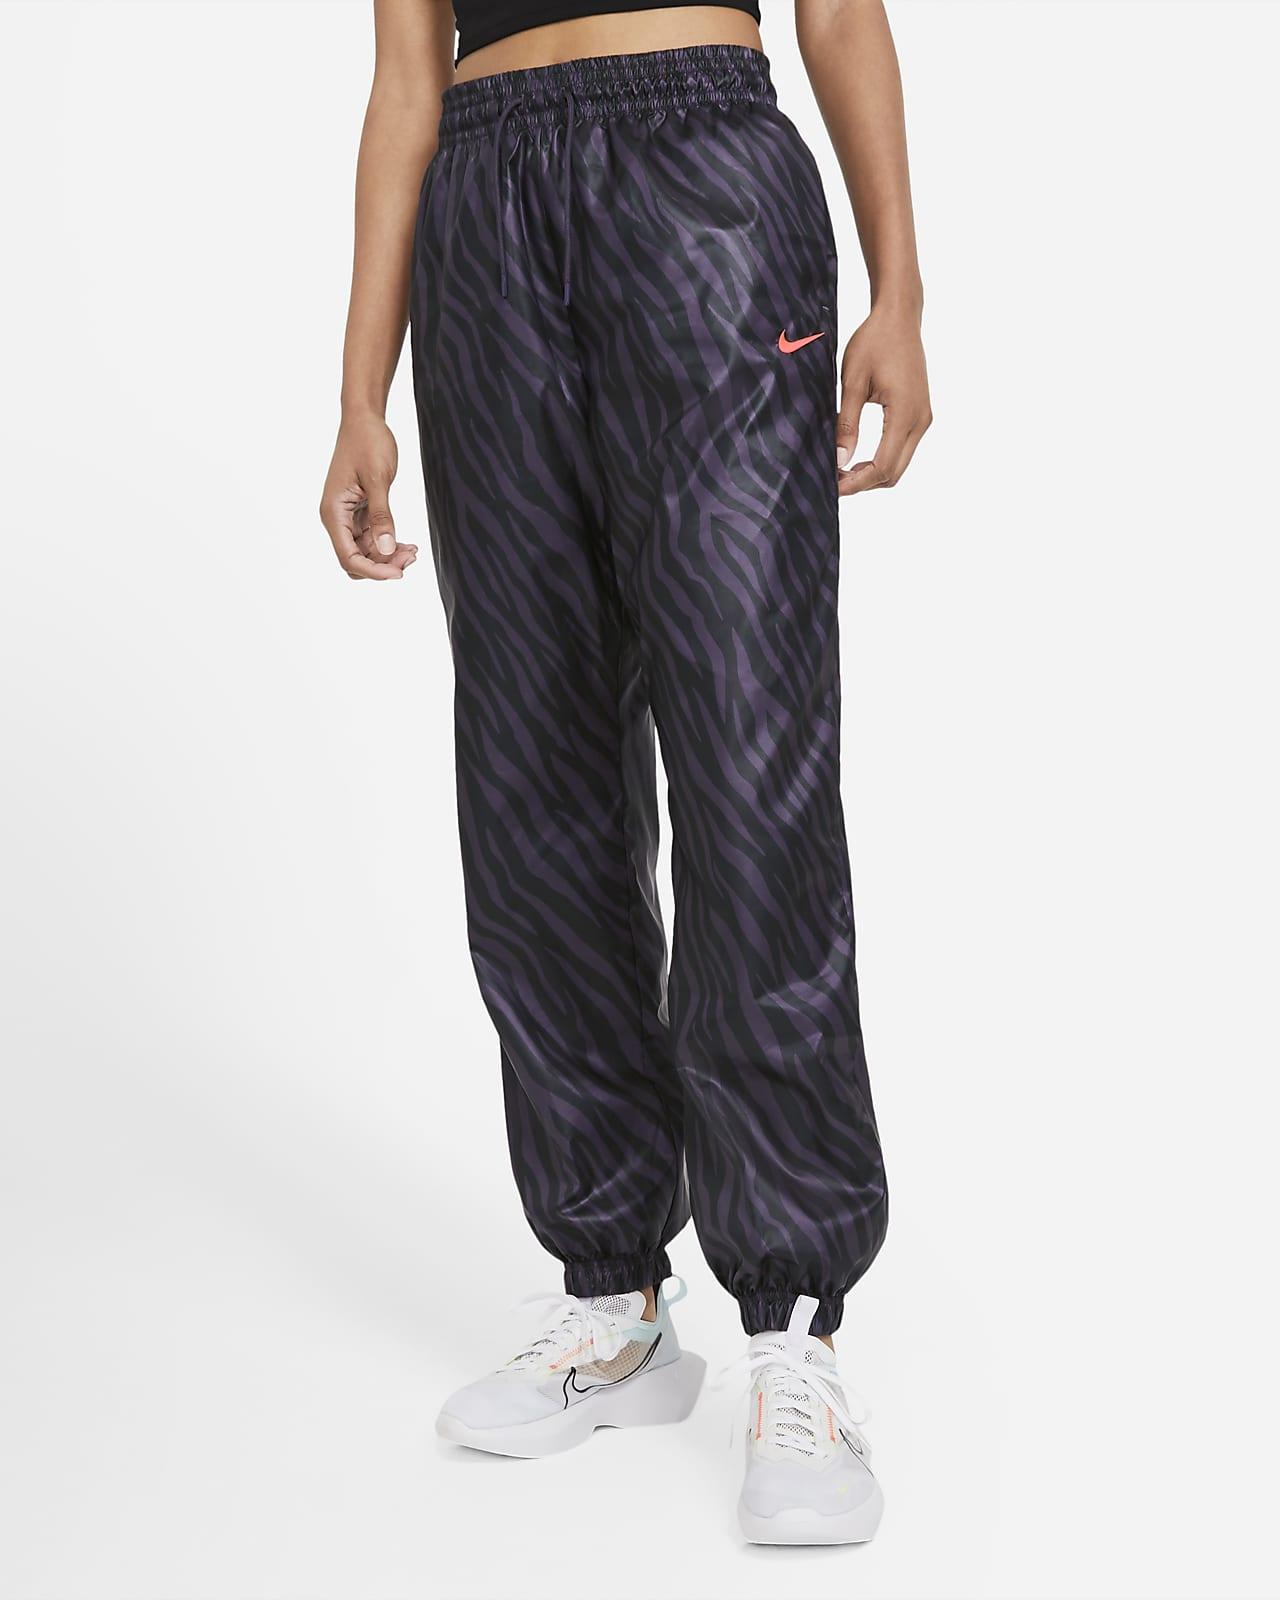 Pantalones para mujer Nike Sportswear Icon Clash